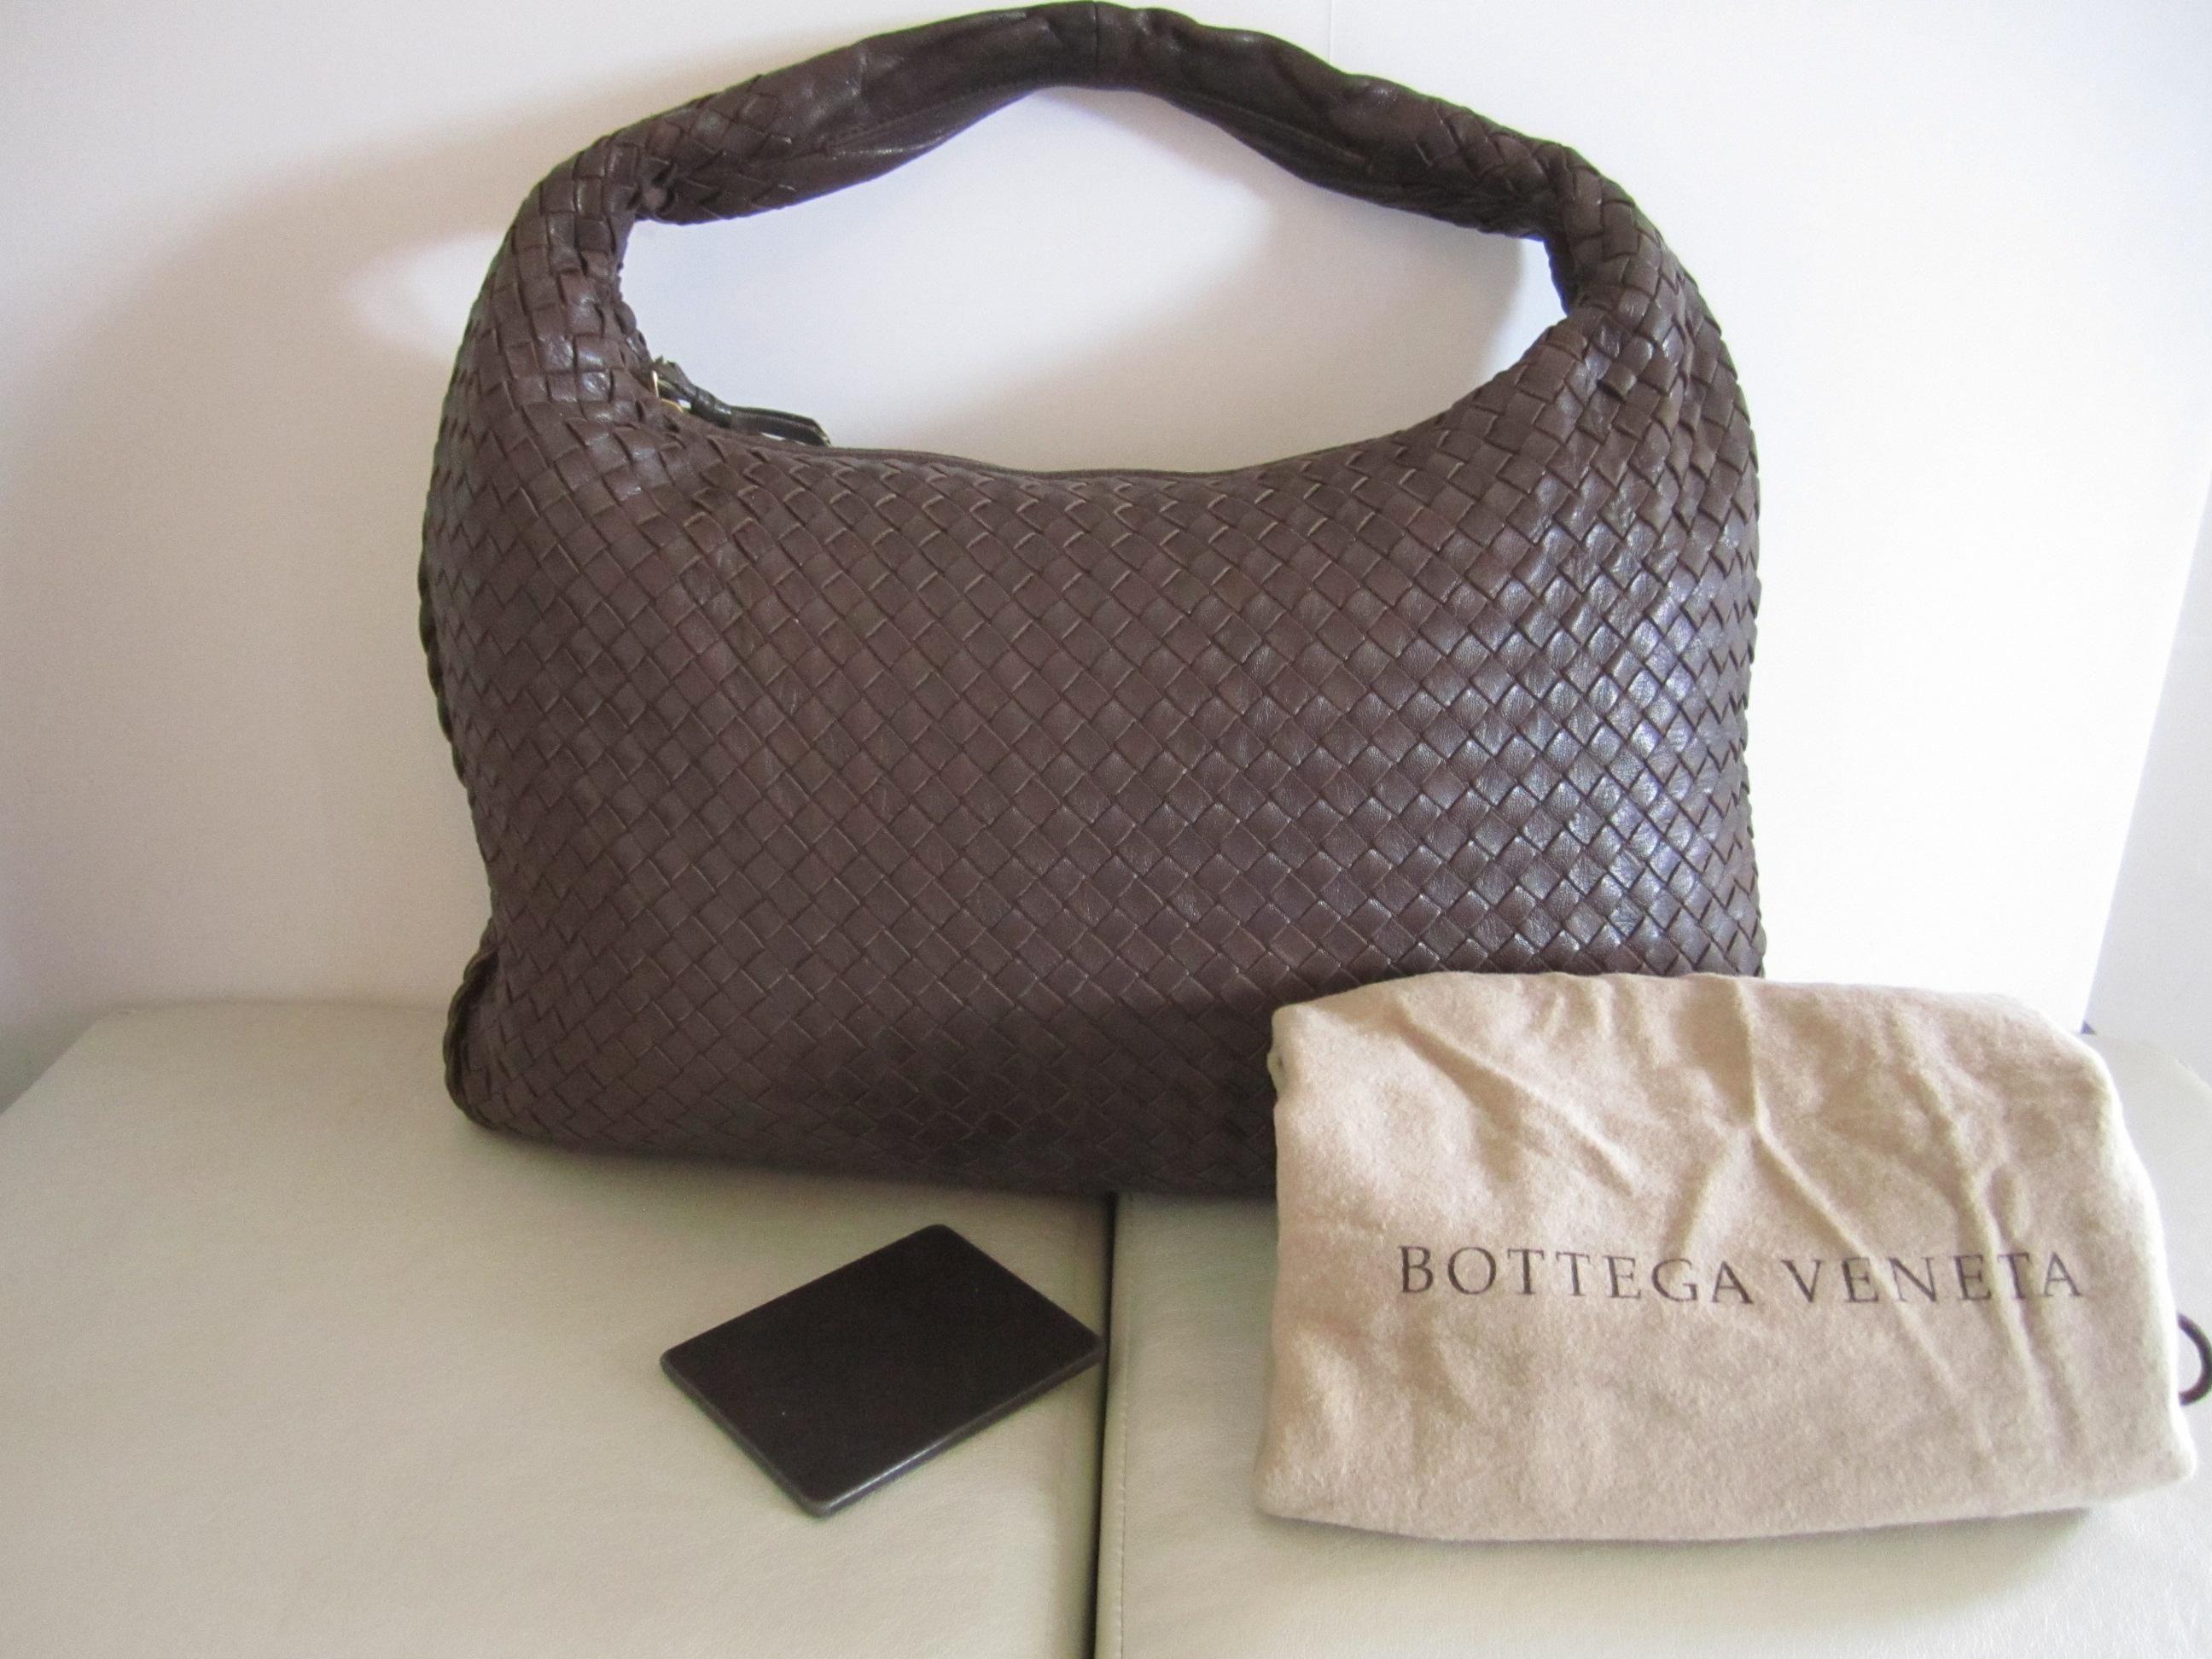 93b468d16149 Bottega Veneta Intrecciato Leather Hobo With Mirror Shoulder Bag. Get one  of the hottest styles of the season! The Bottega Veneta Intrecciato Leather  Hobo ...